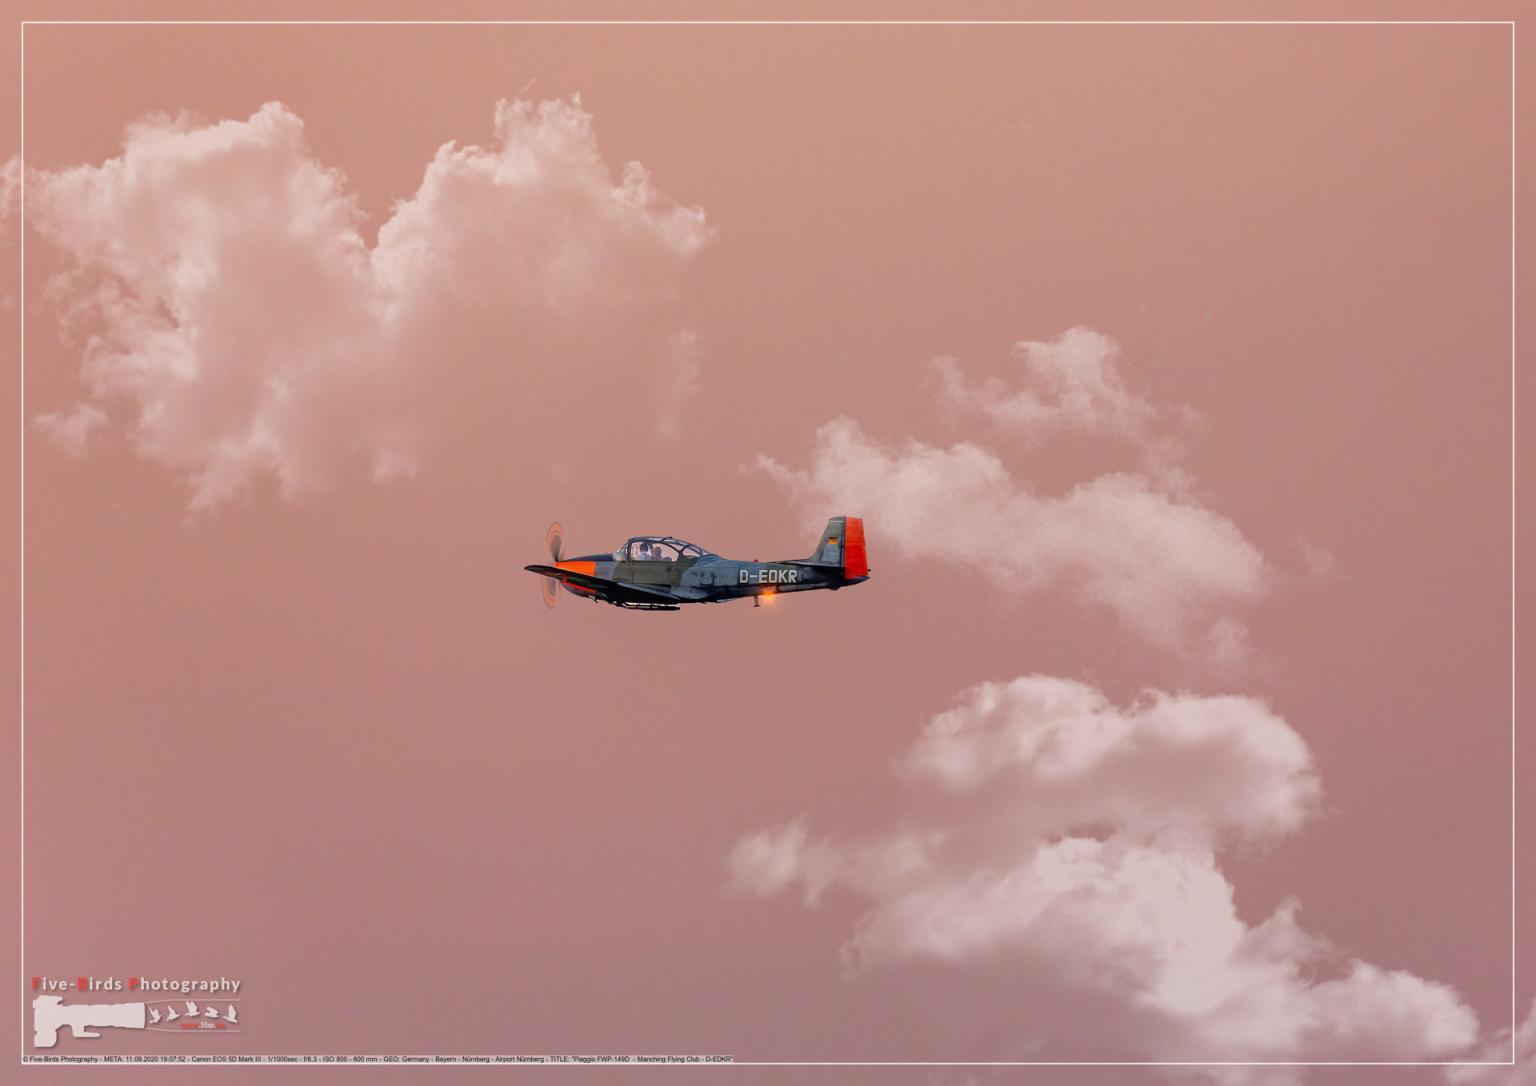 Piaggio FWP-149D - Manching Flying Club - D-EDKR